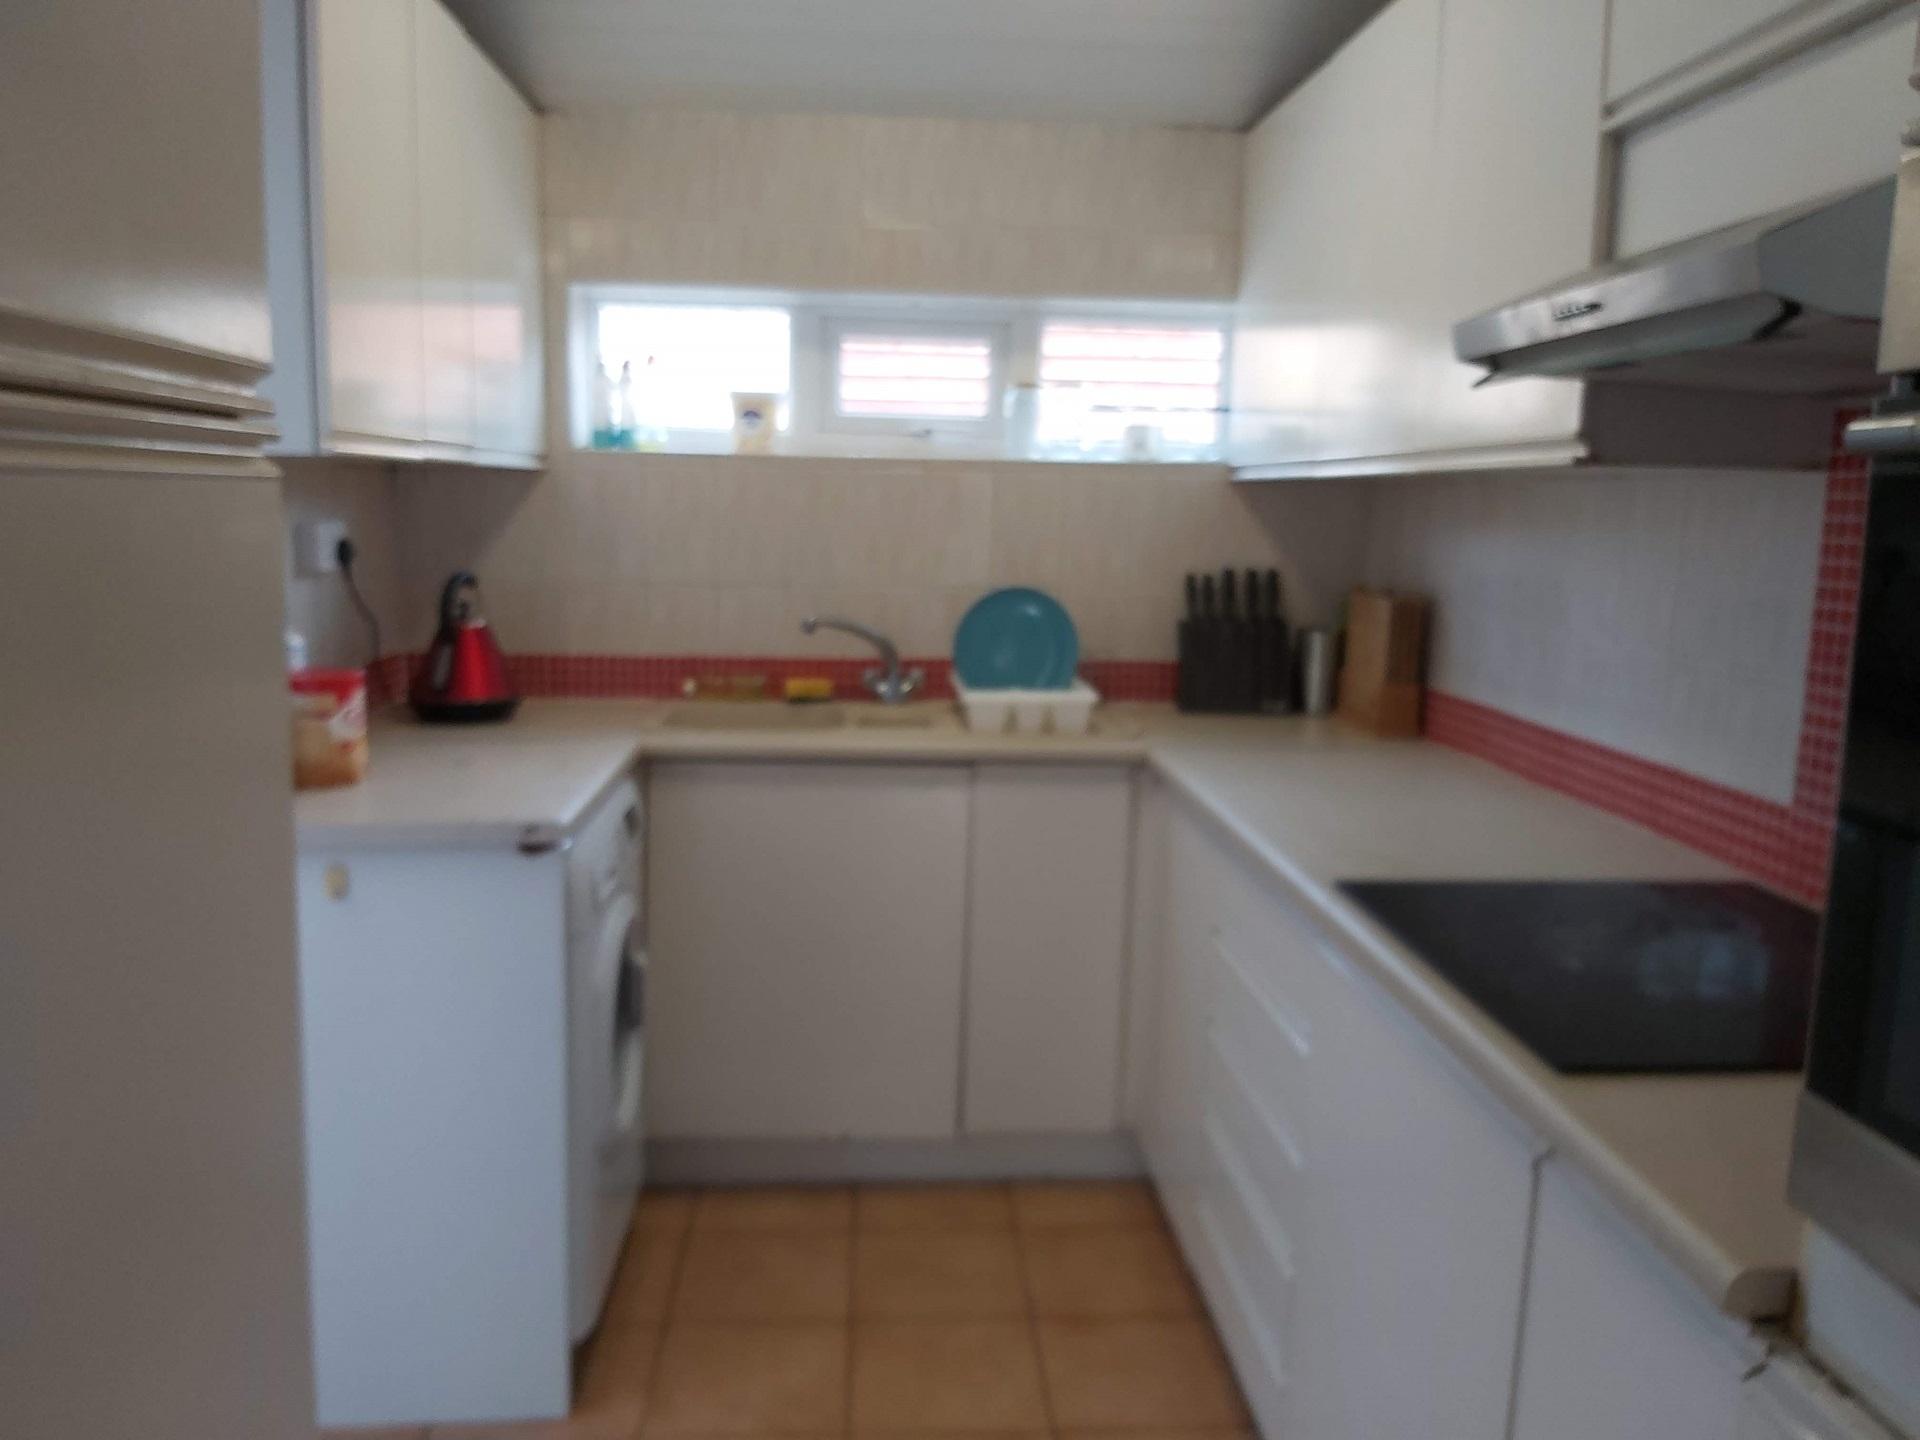 Kitchen at Garden City House, Carlton, Nottingham - Citybase Apartments